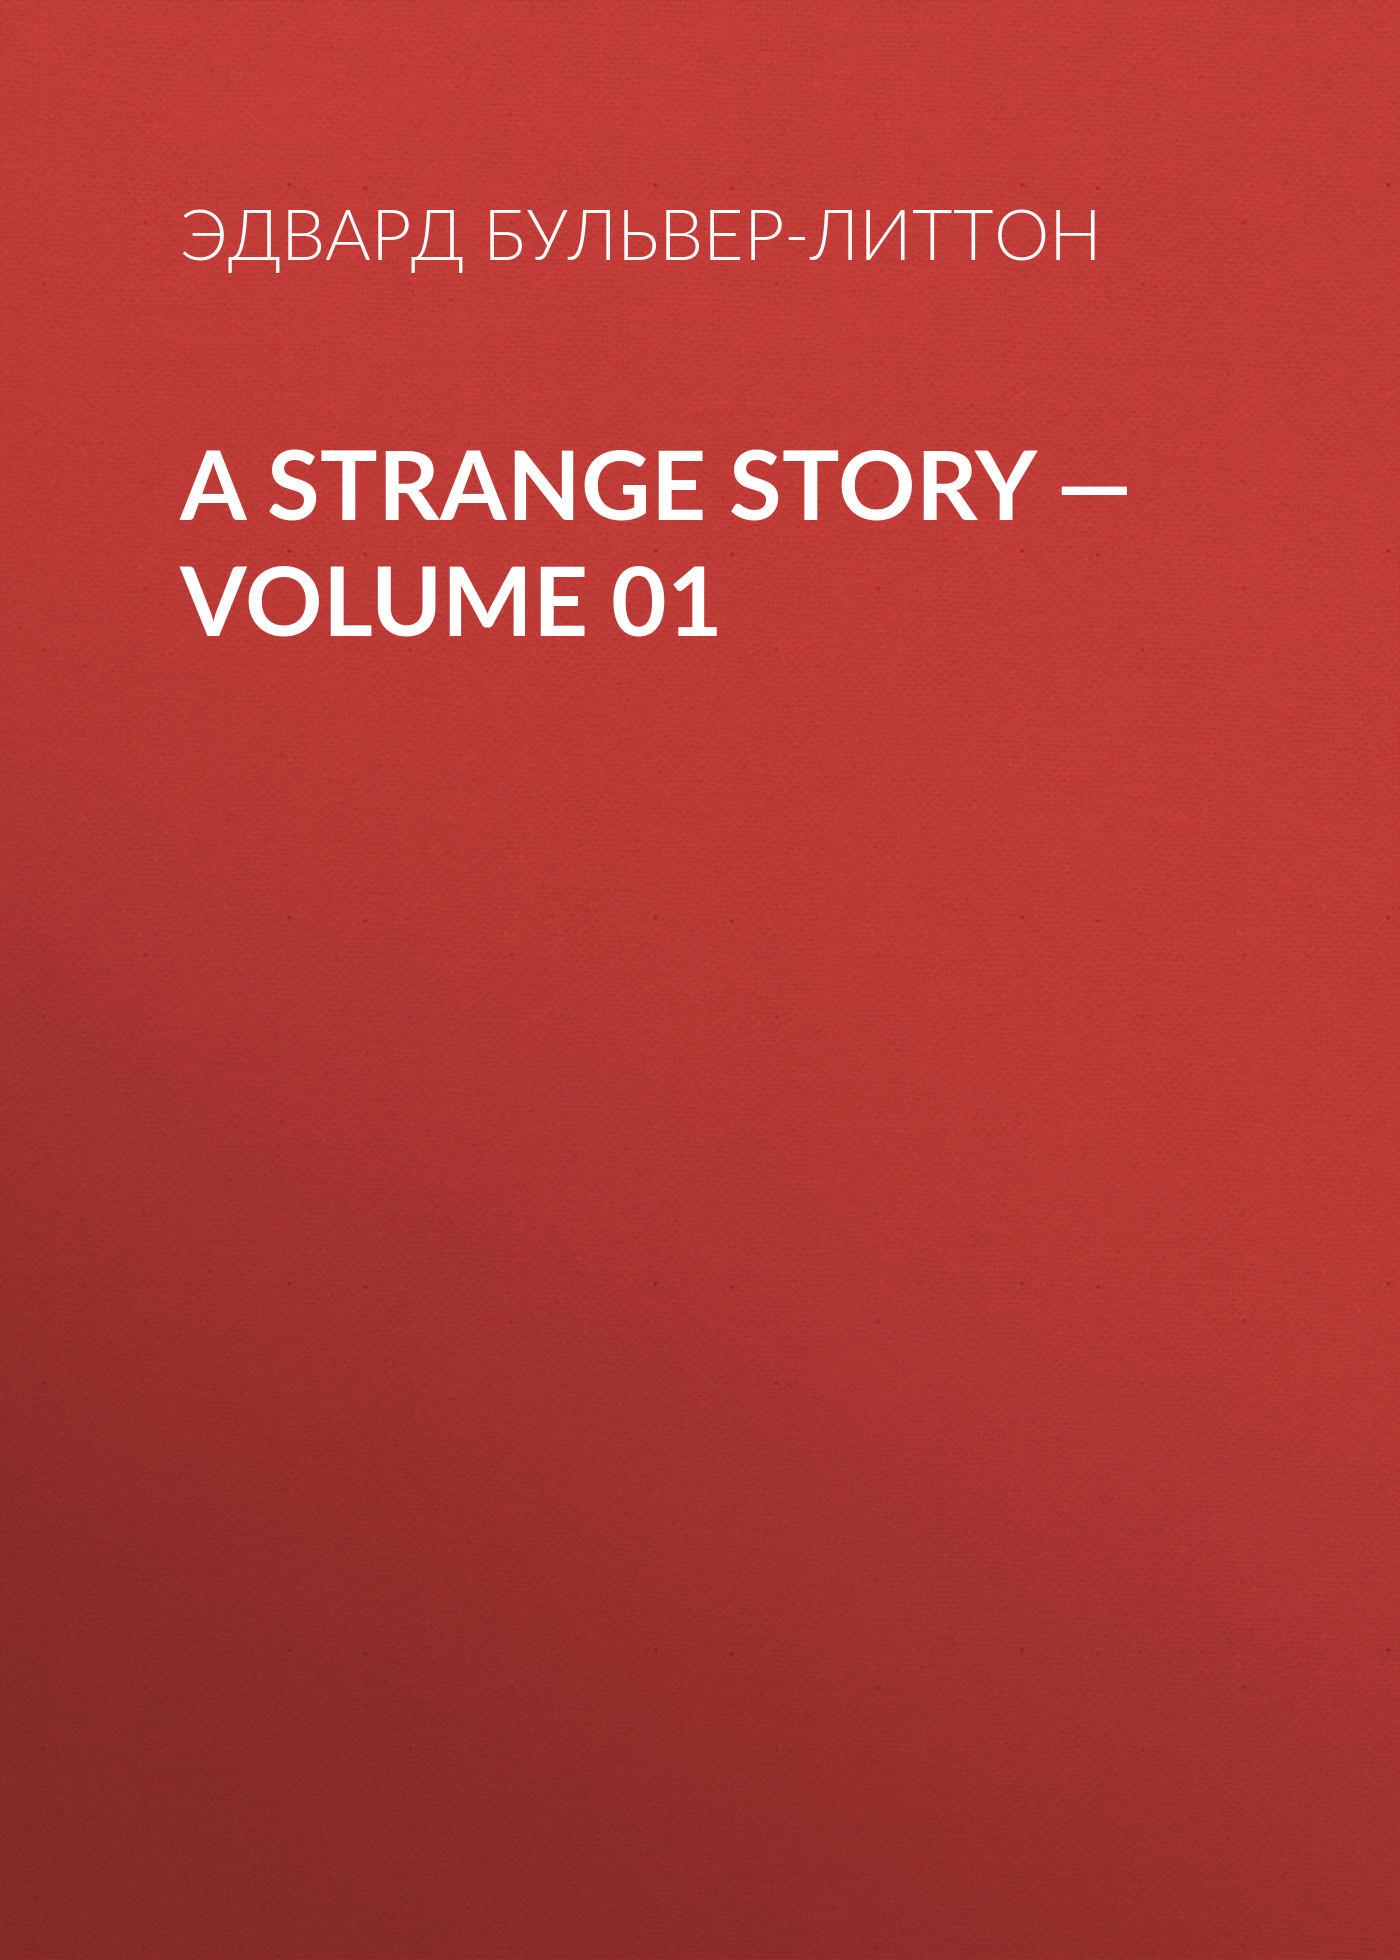 A Strange Story — Volume 01